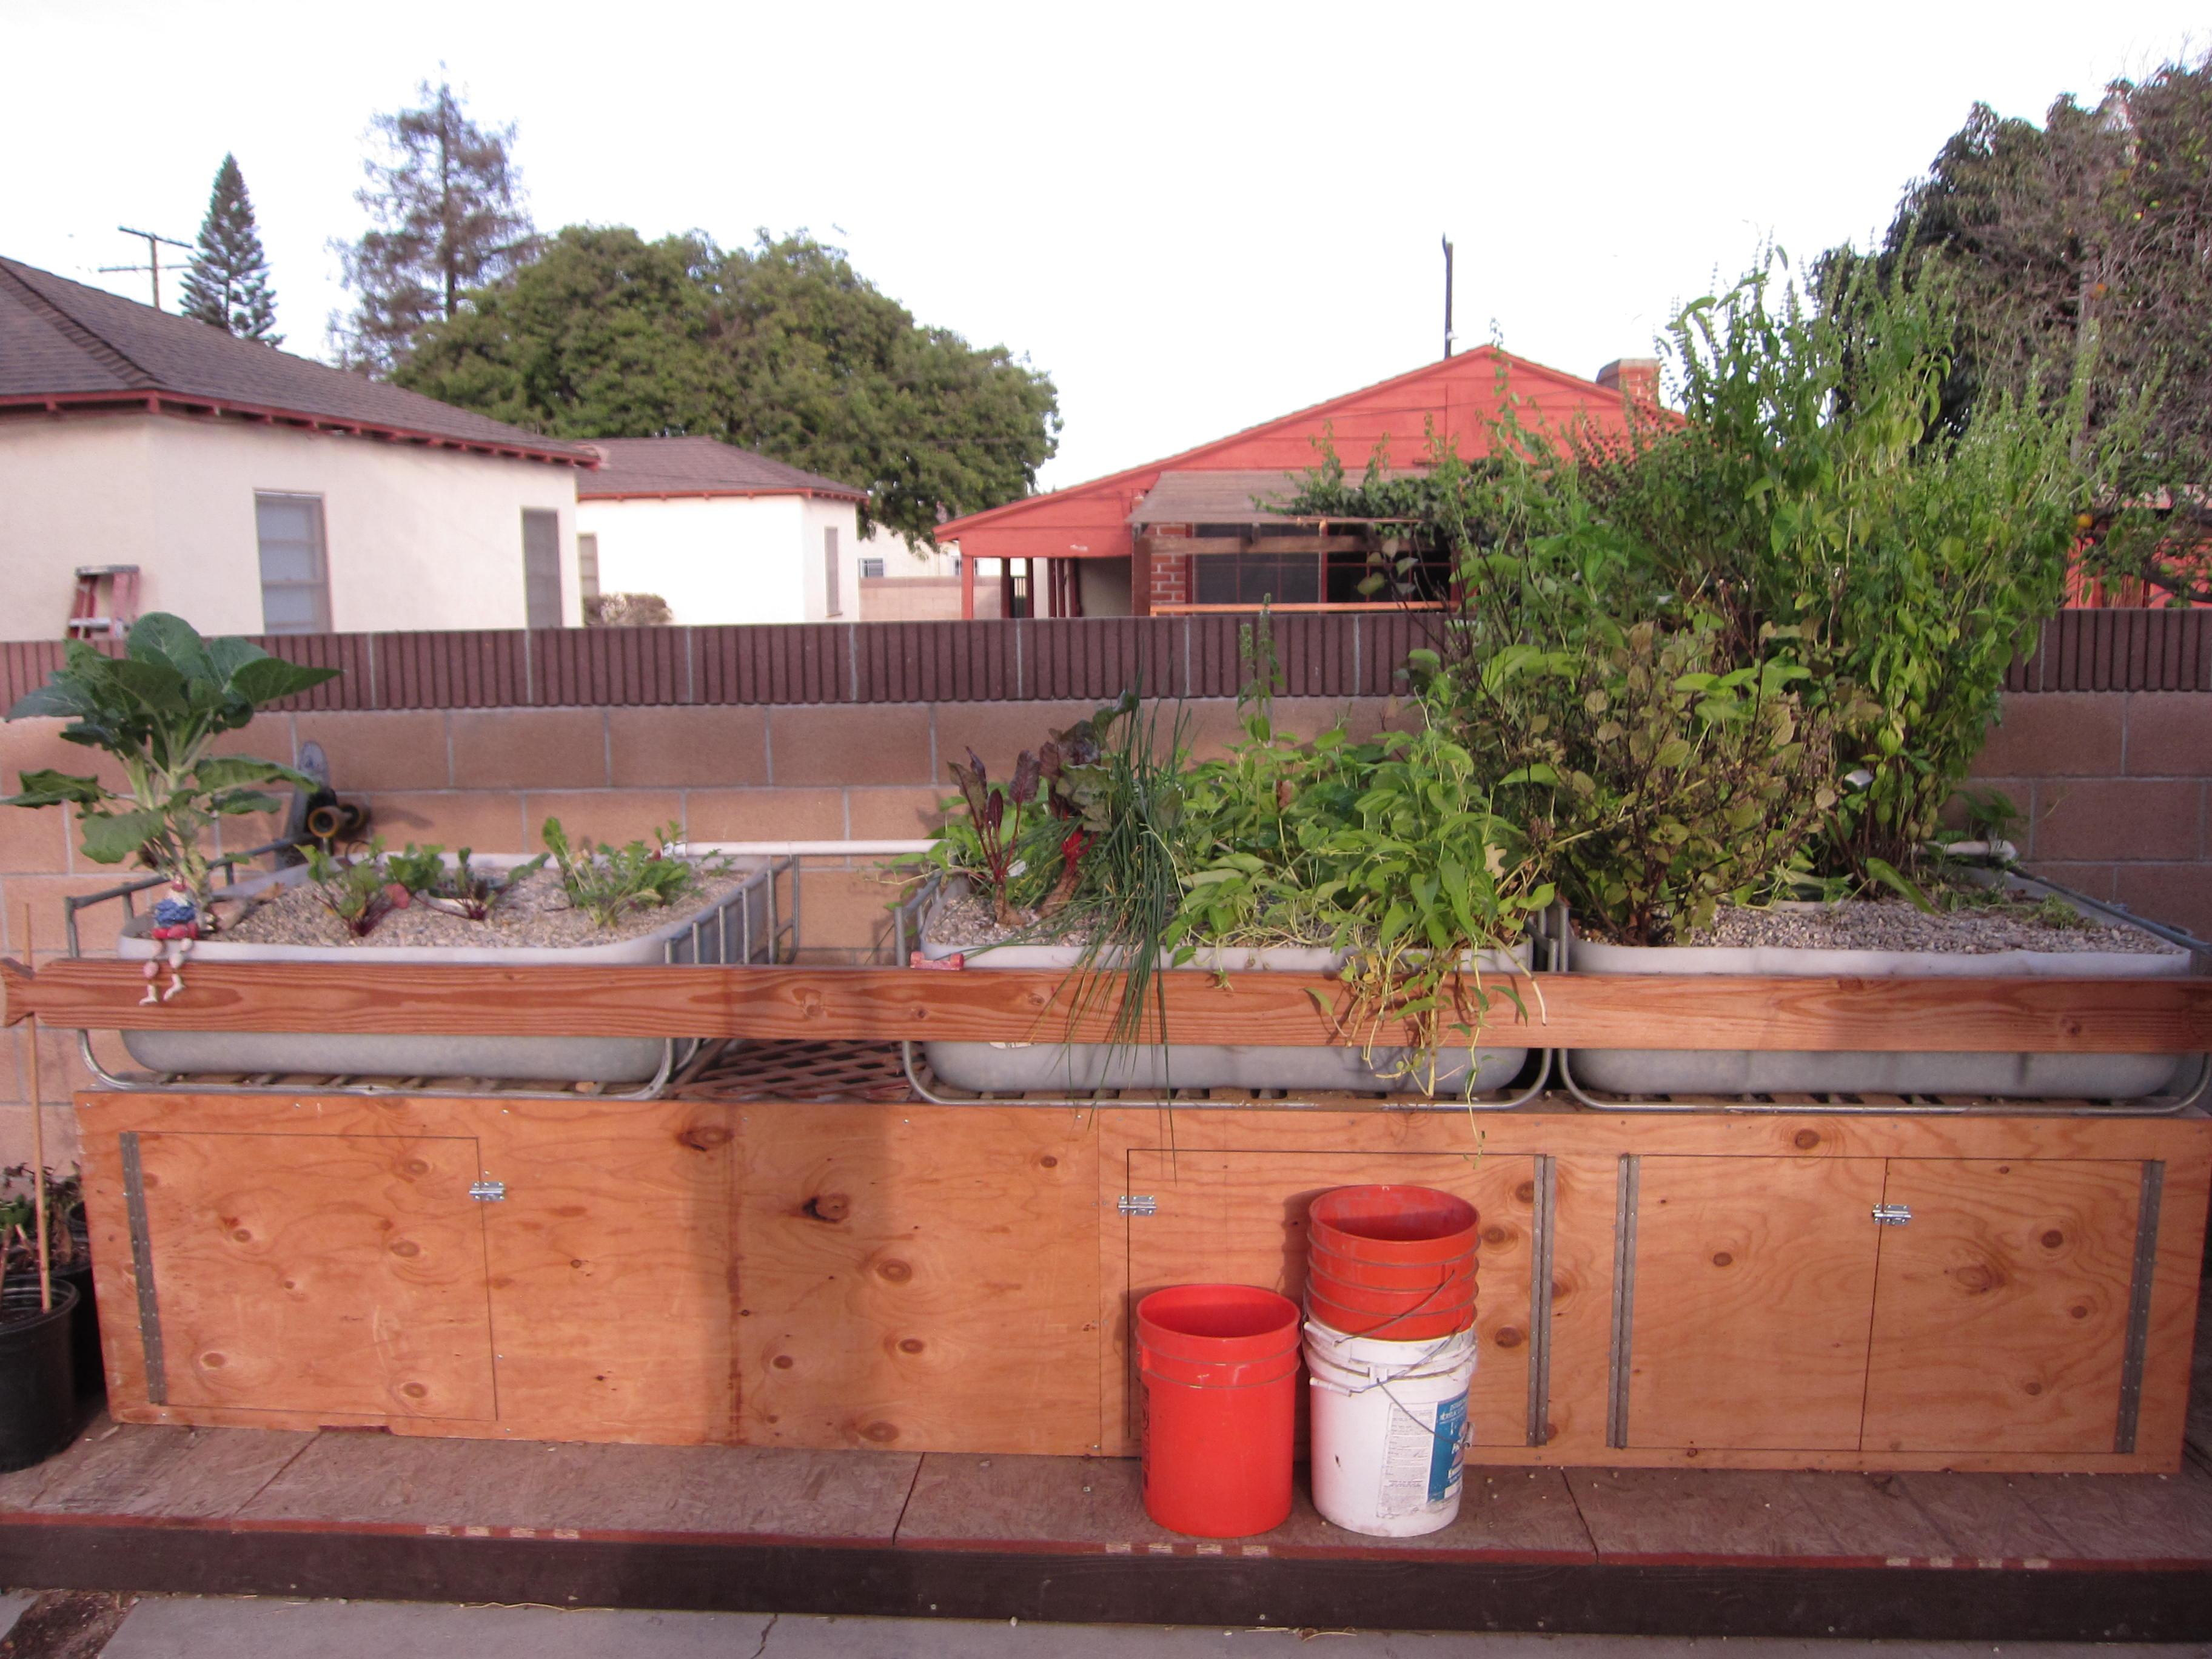 An aquaponics garden lines the driveway.